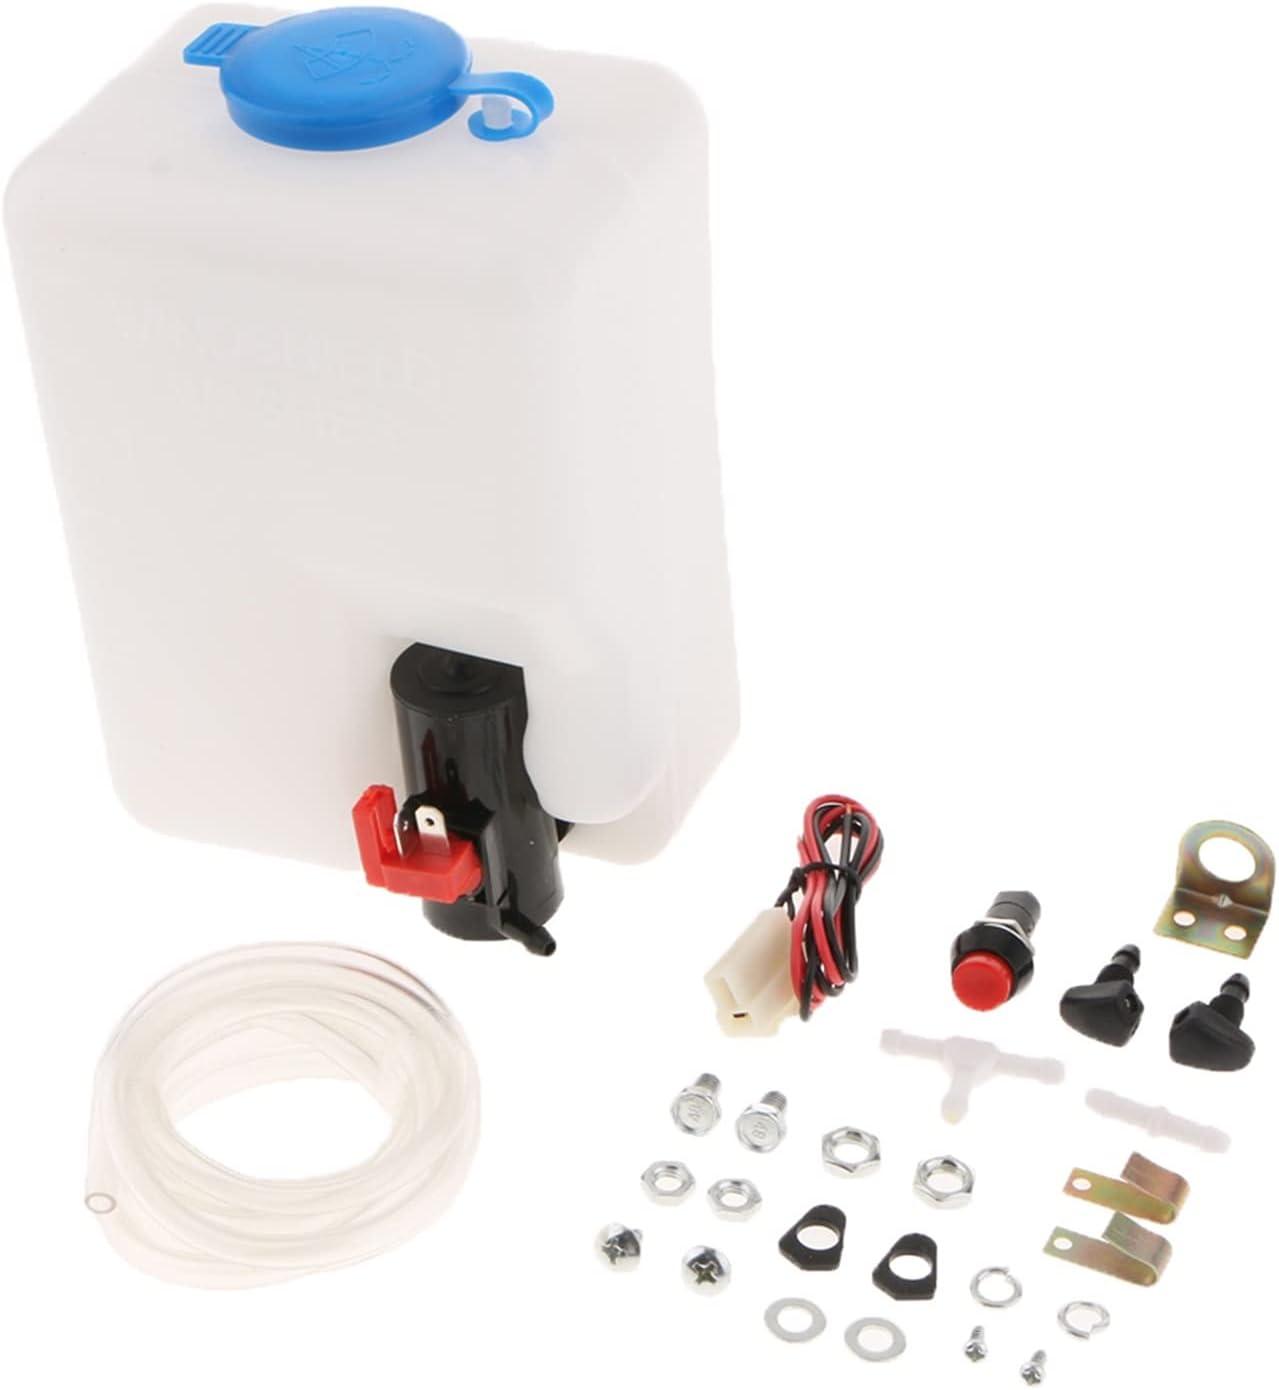 MNAD El Paso Mall Discount is also underway Car Windshield Glass Wiper Universal Washer System Reservoi